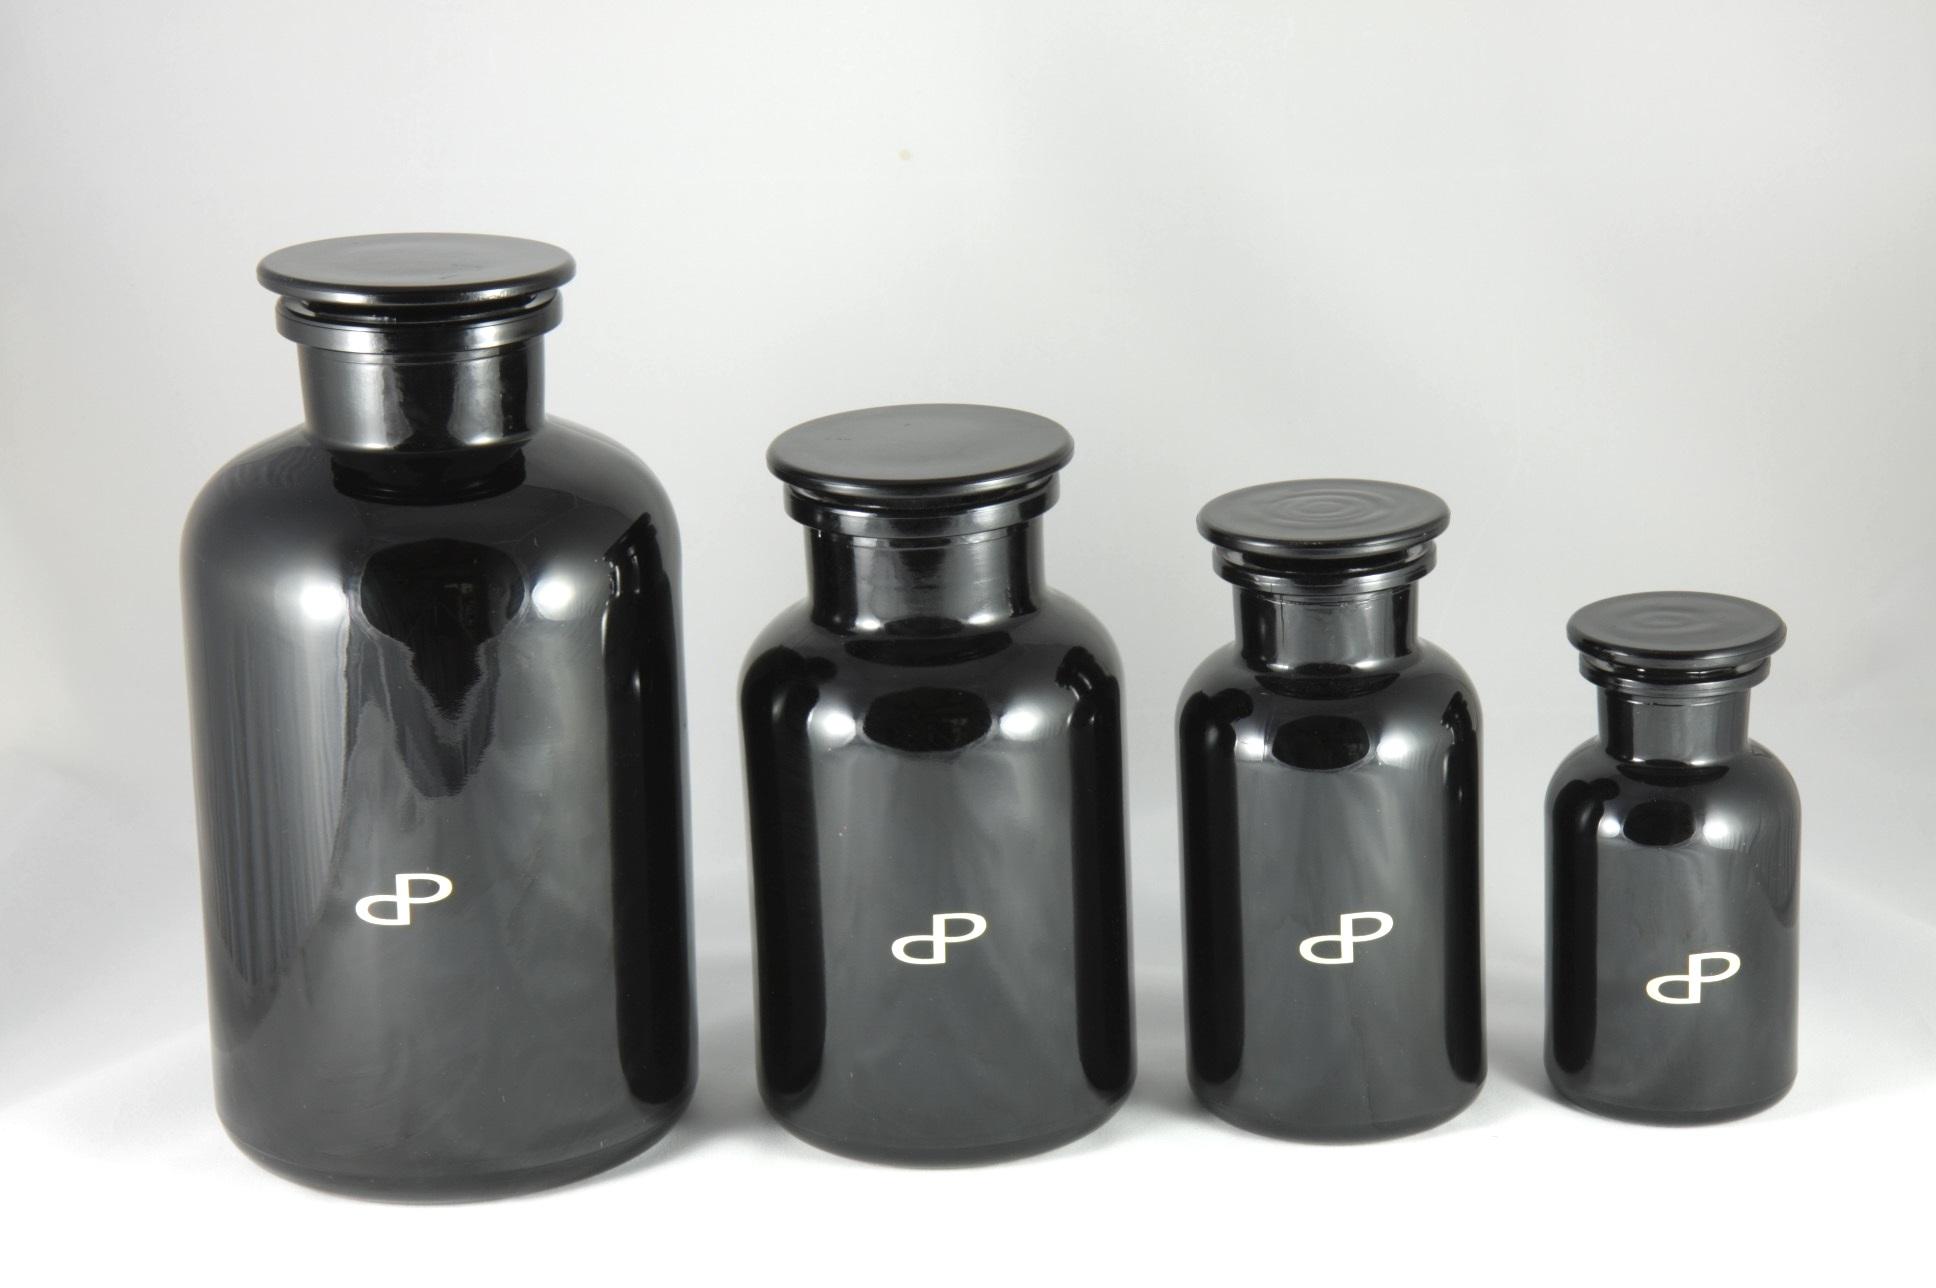 pot apothicaire purple pot guano diffusion. Black Bedroom Furniture Sets. Home Design Ideas